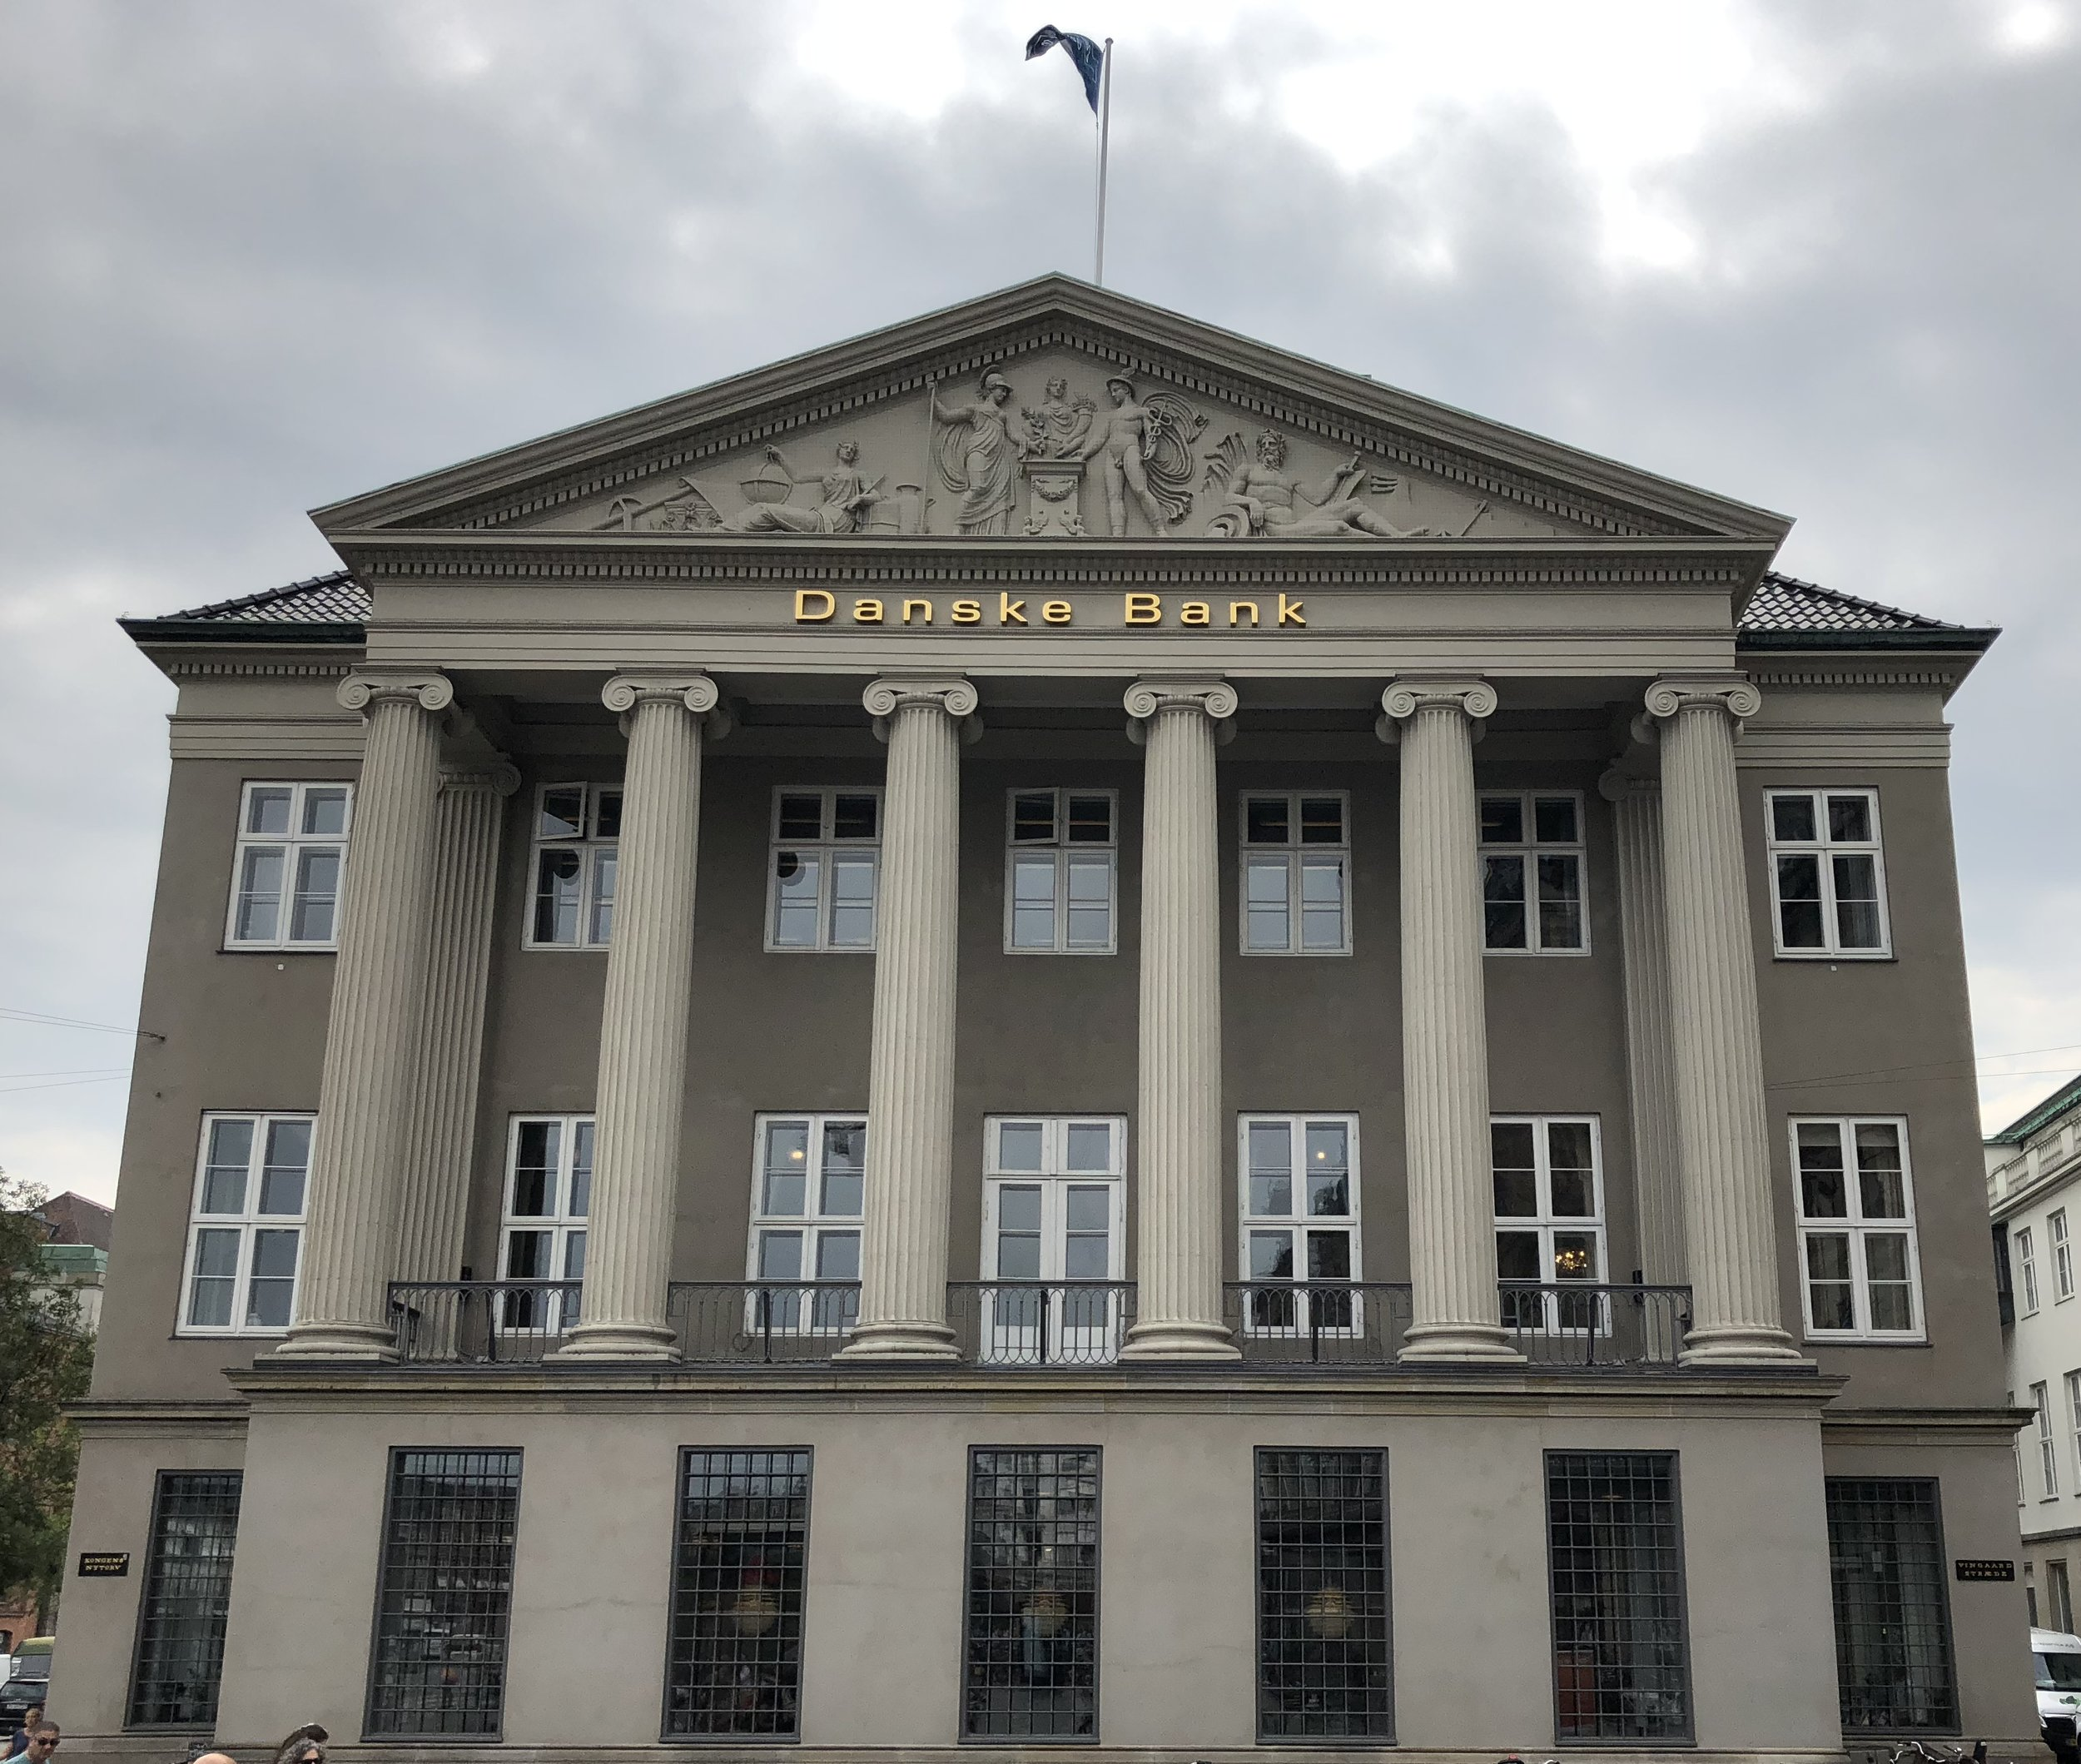 The headquarters of Dankse Bank in Copenhagen pictured in 2018. (Wikimedia Commons)